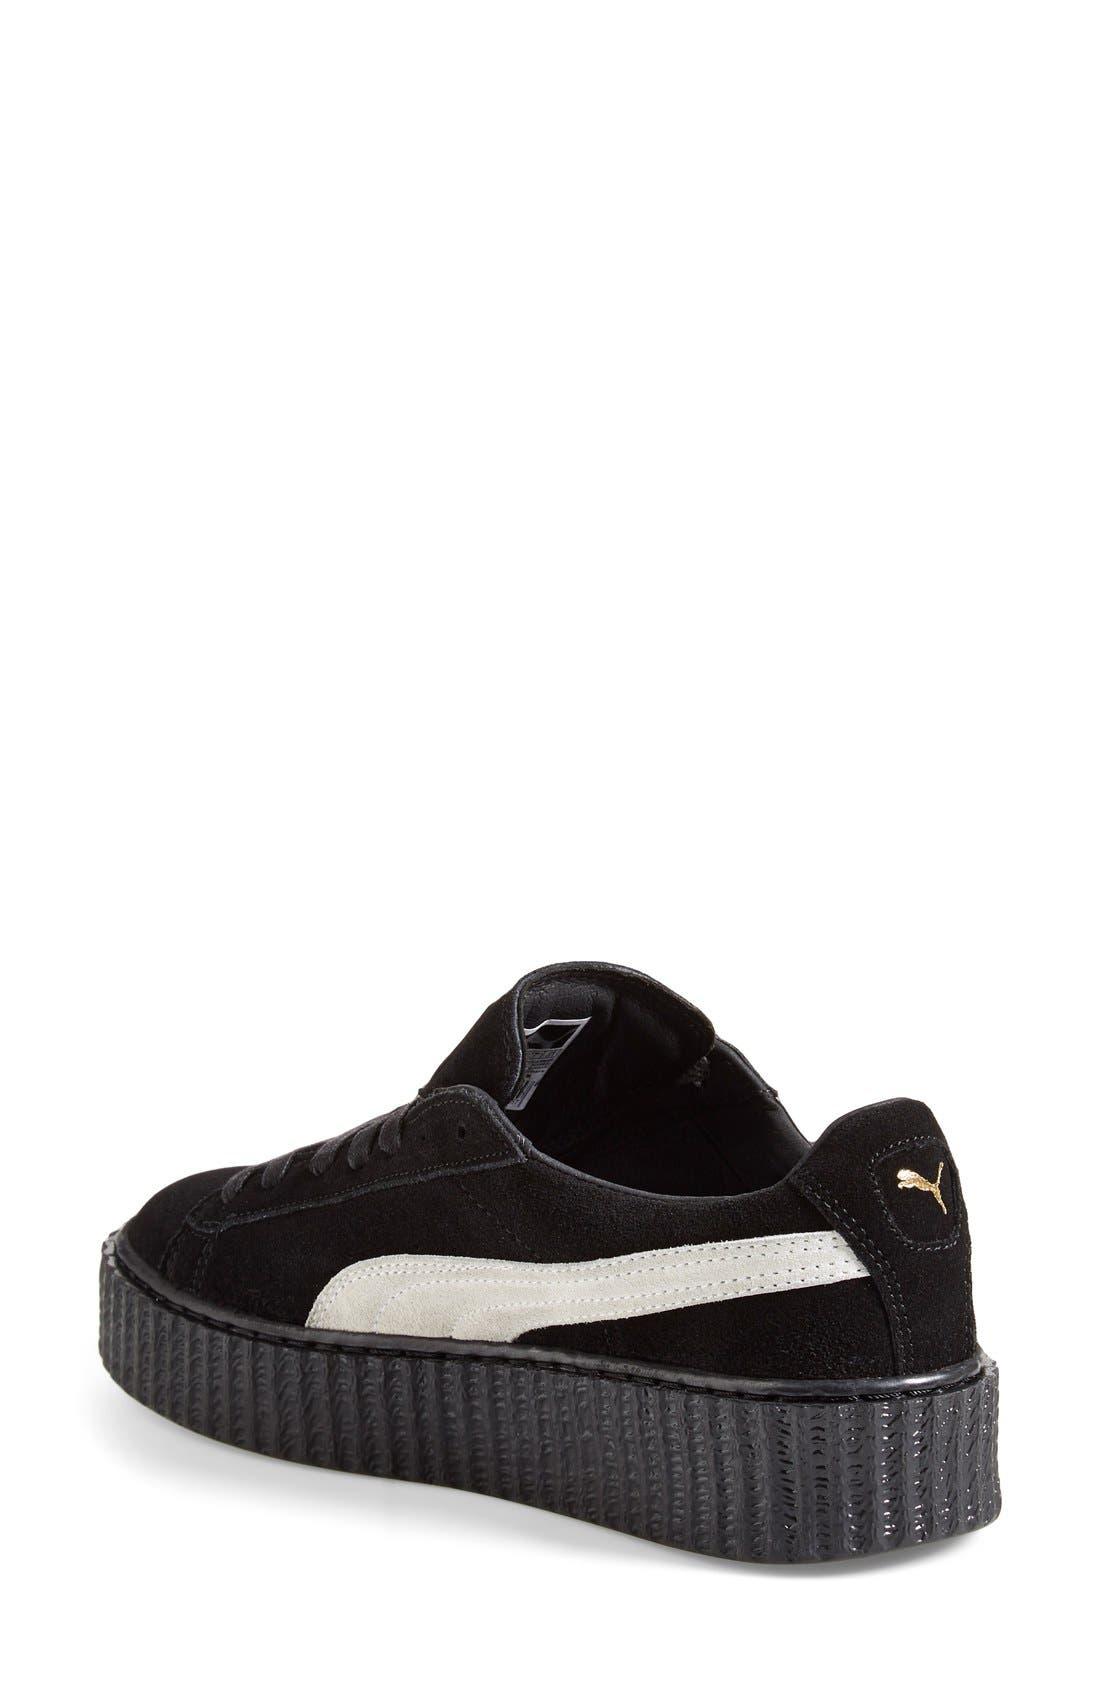 PUMA, FENTY PUMA by Rihanna Creeper Sneaker, Alternate thumbnail 5, color, 001